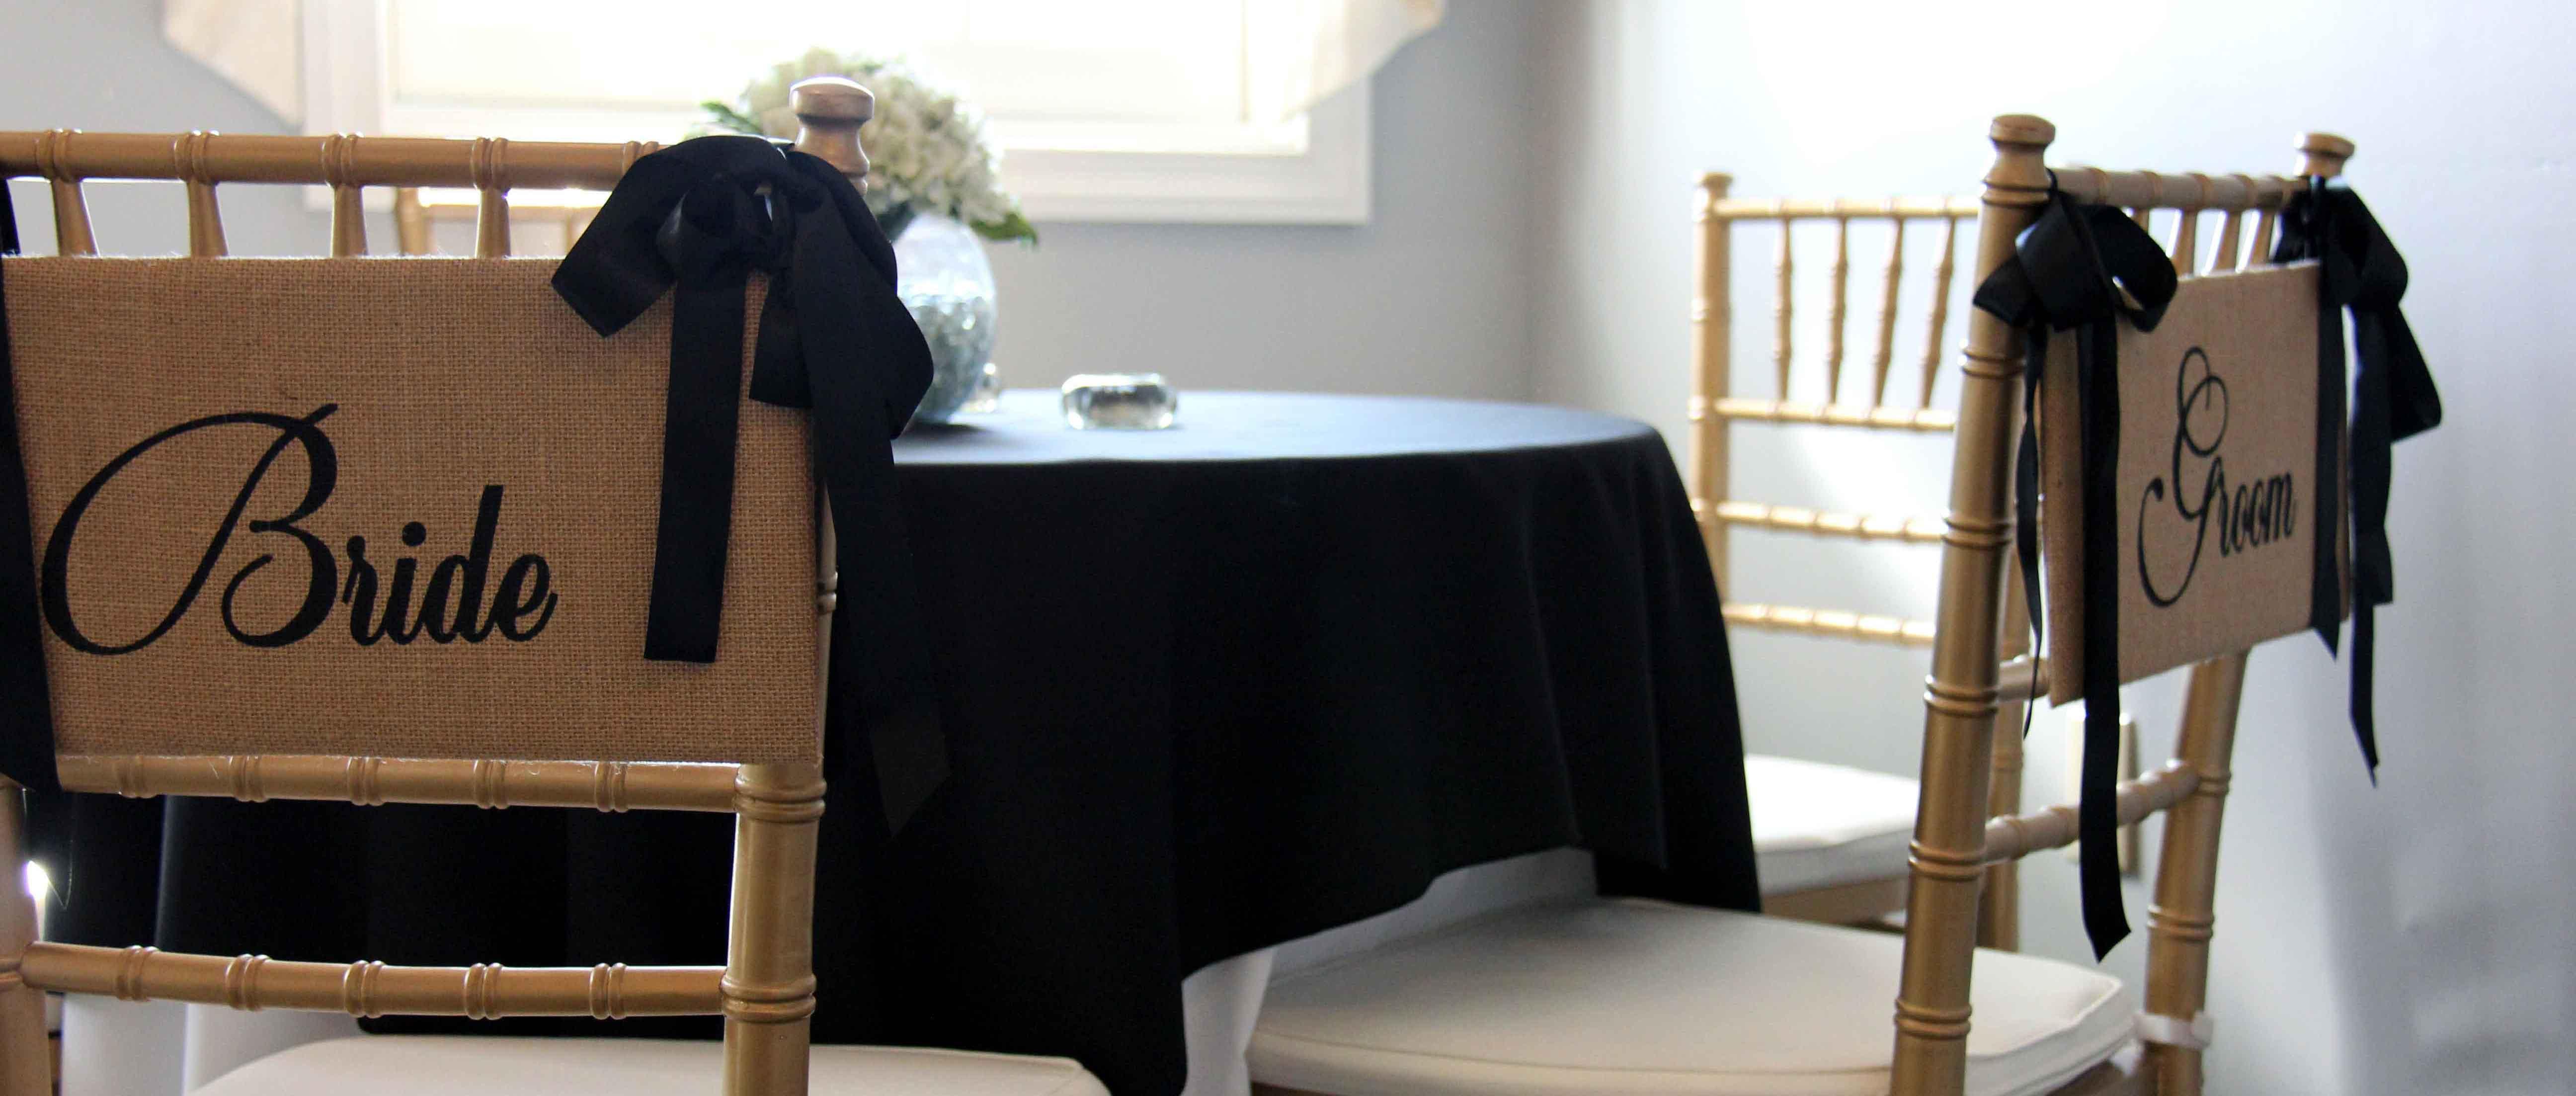 wedding venue nashville, tn